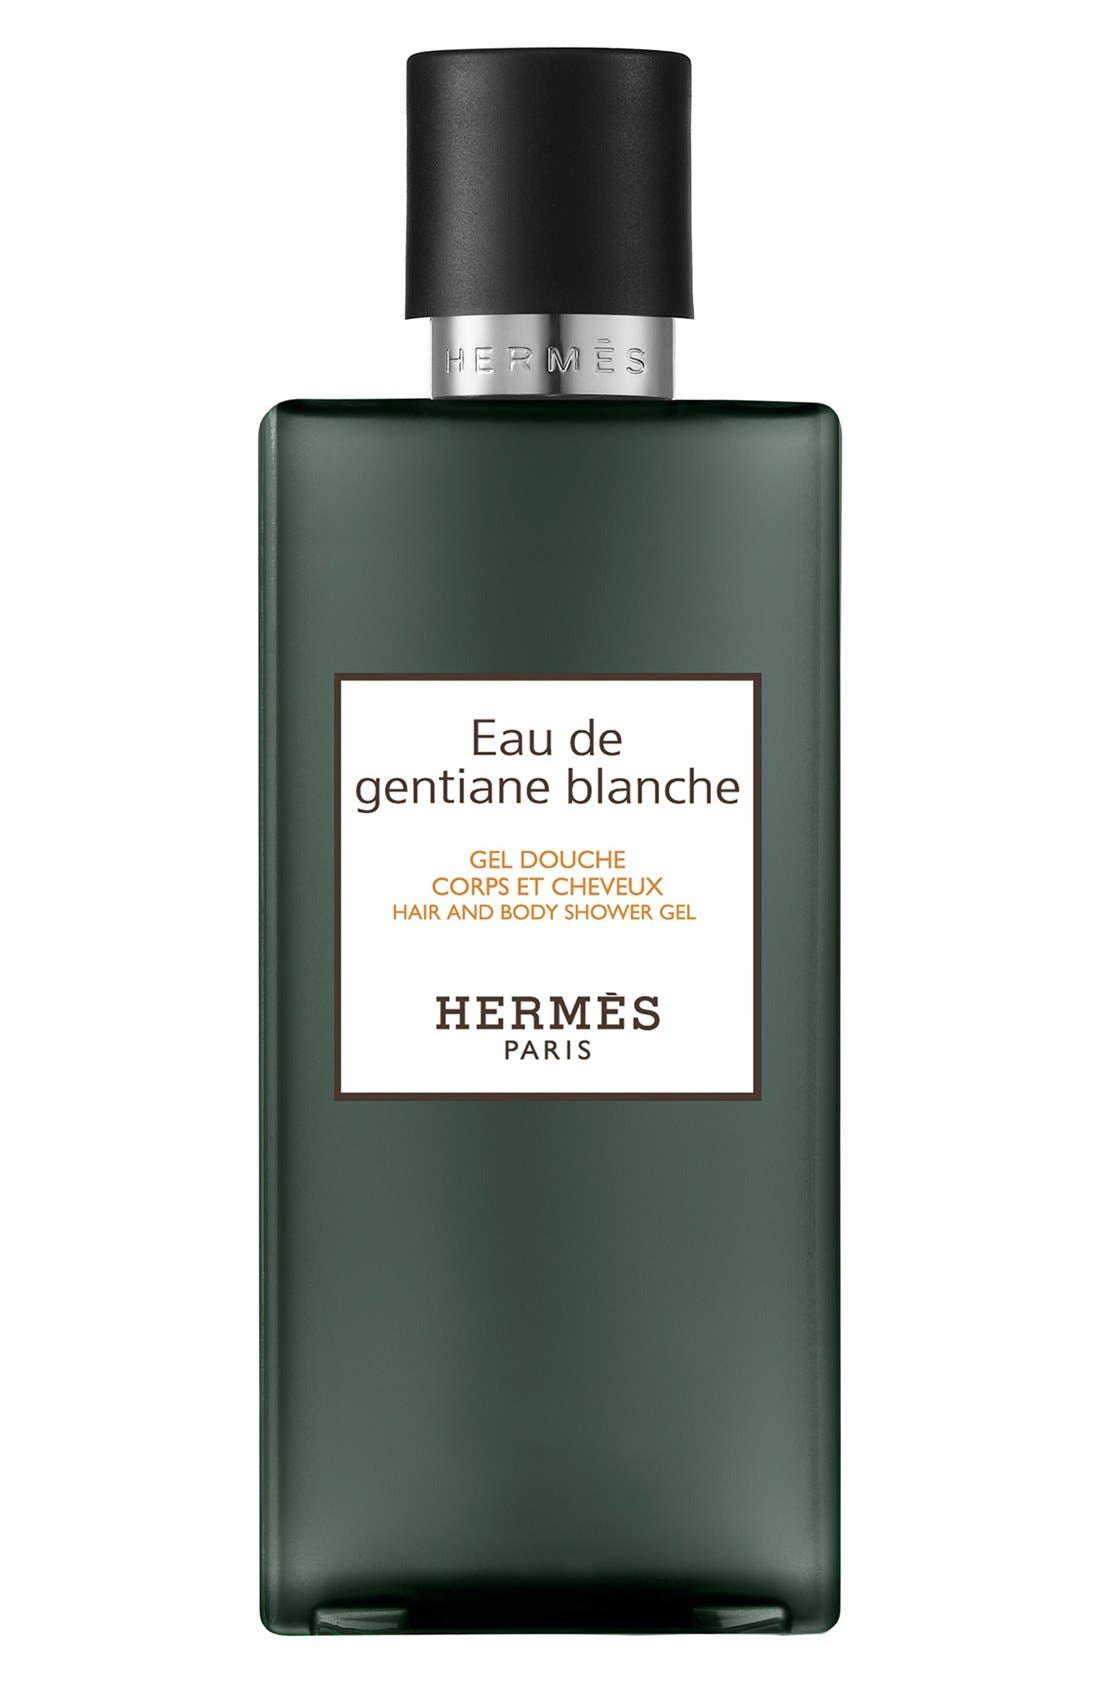 Hermès Eau de Gentiane Blanche - Hair and body shower gel